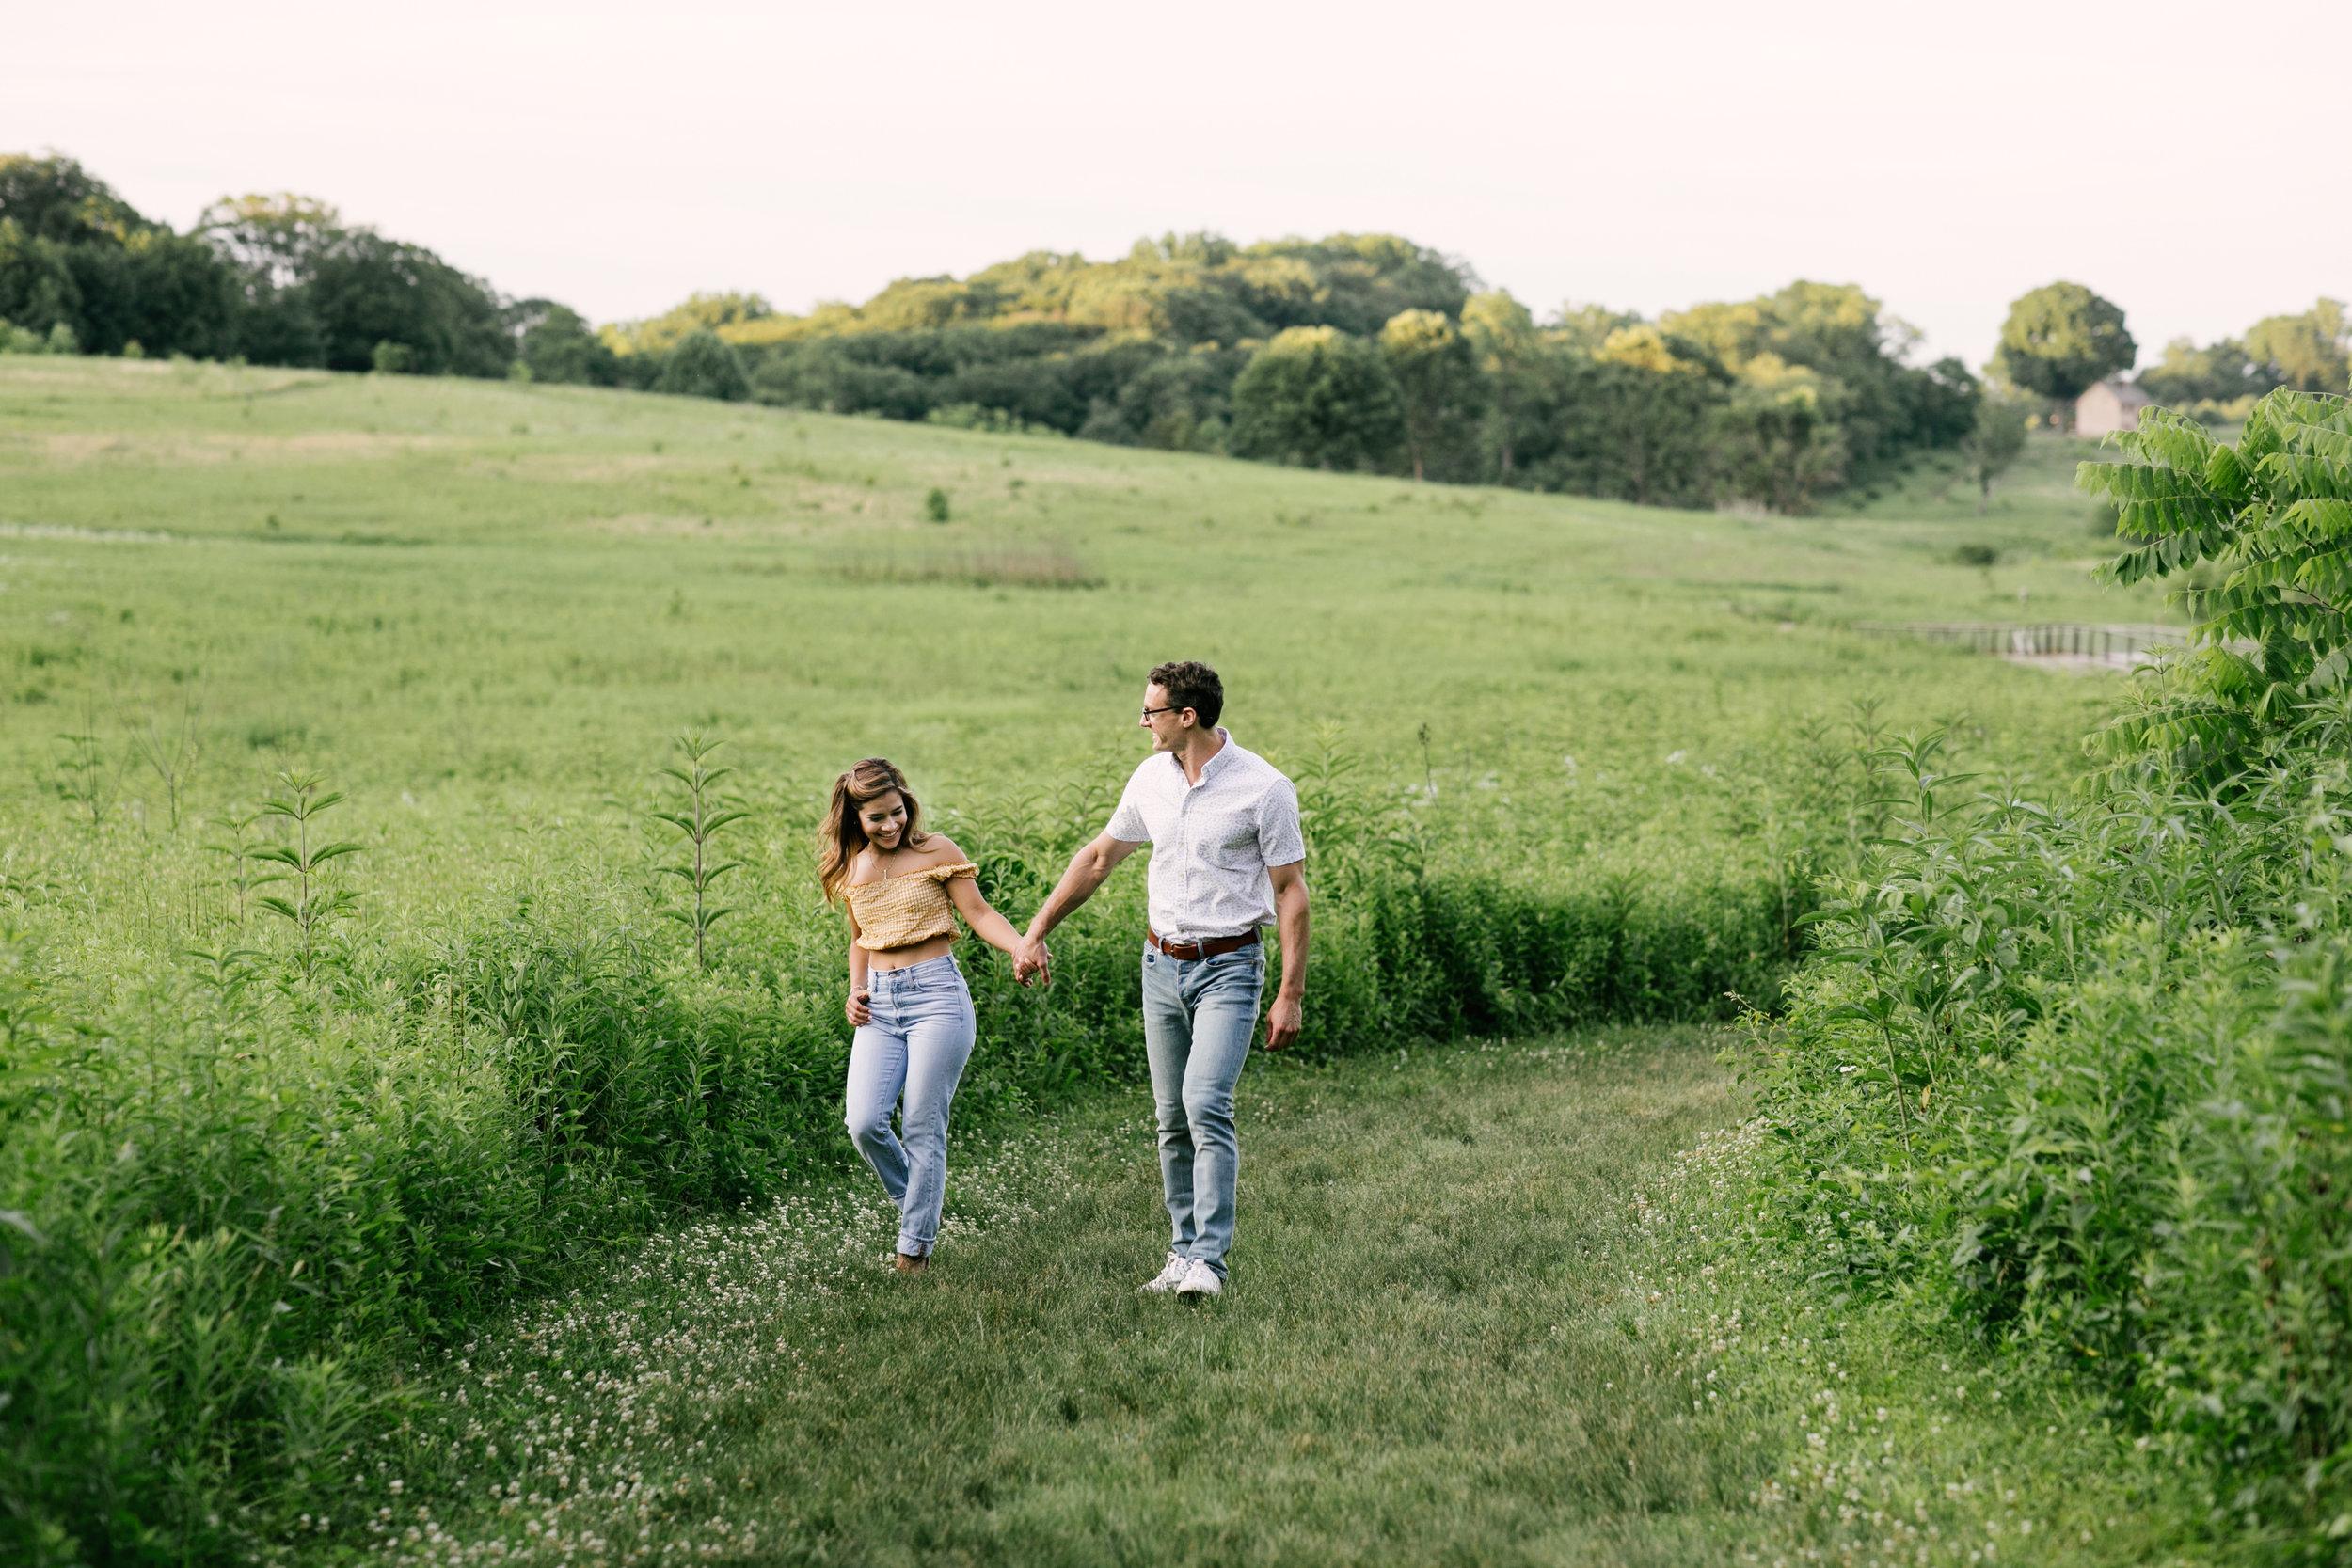 photography-natural-candid-engaged-proposal-philadelphia-wedding-longwood gardends-nature-flowers-modern-lifestyle-04.JPG